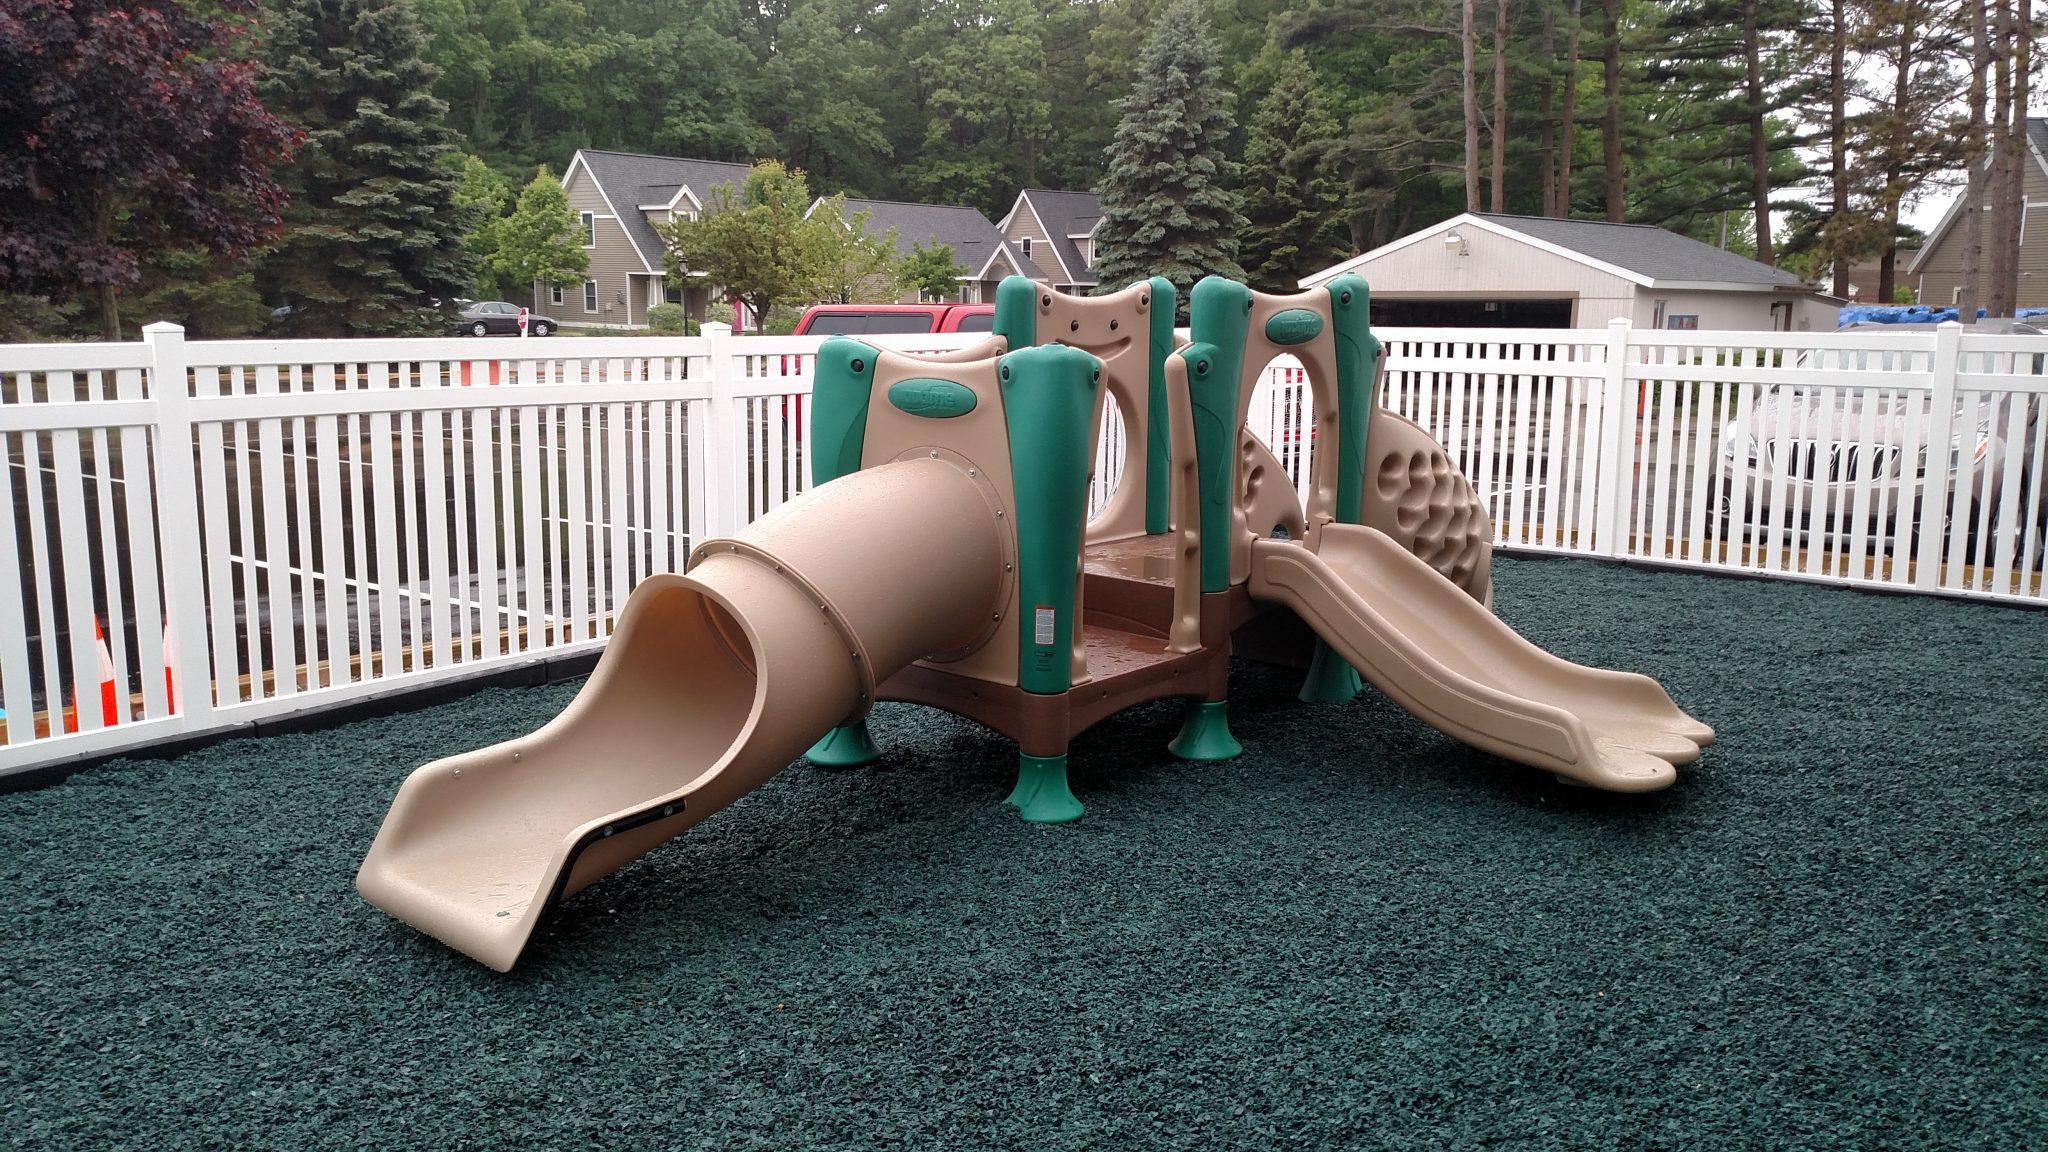 Nursery outside play ground